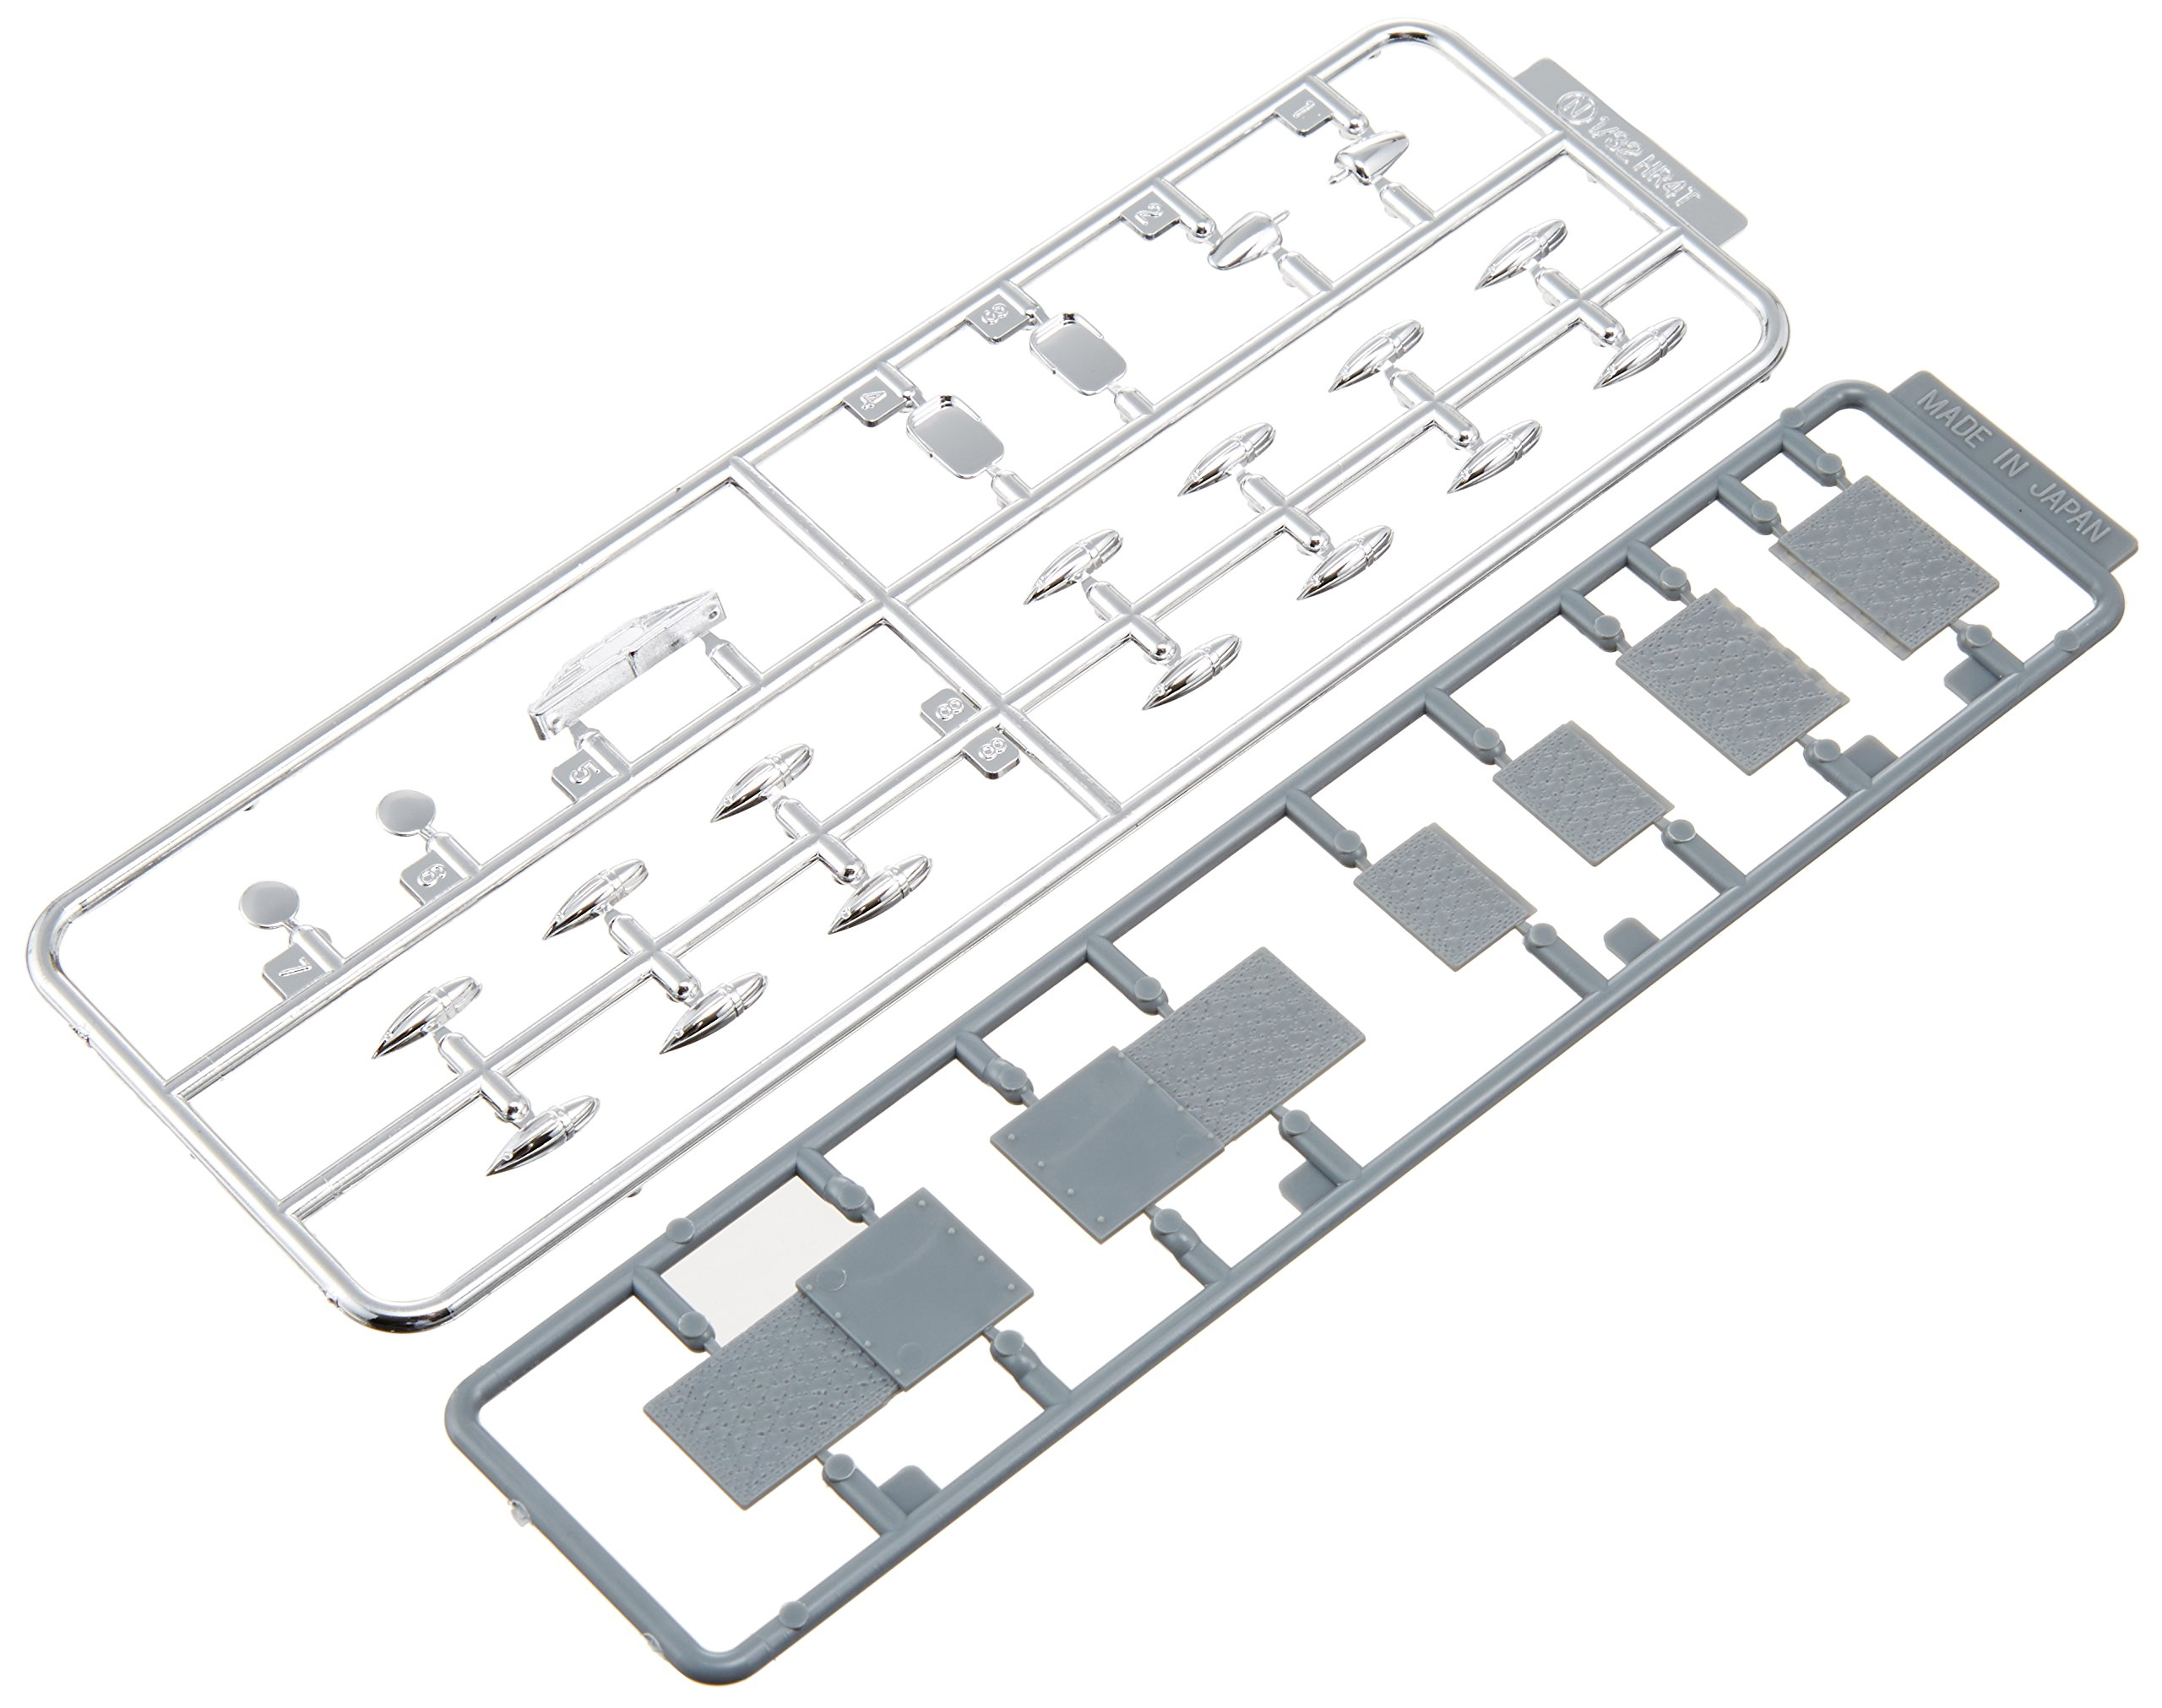 Fujimi 1/32 Highway Aesthetics Series No.10 (SP10) Set 5 Accessory Upgrade Parts